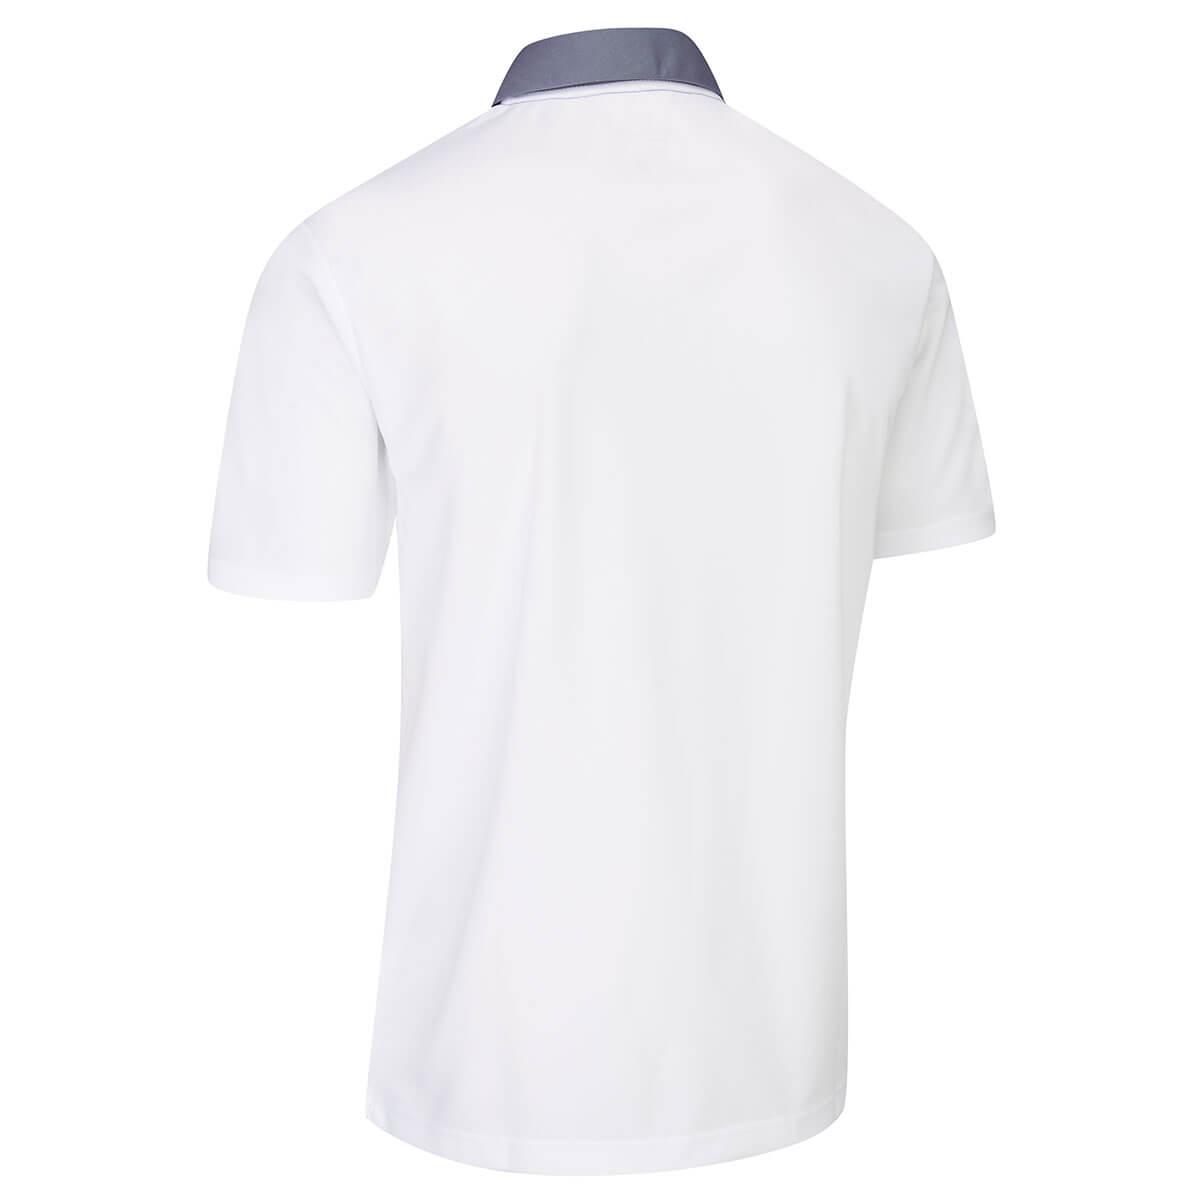 Stuburt-Mens-2019-Evolve-Upton-Quick-Drying-Golf-Polo-Shirt thumbnail 6